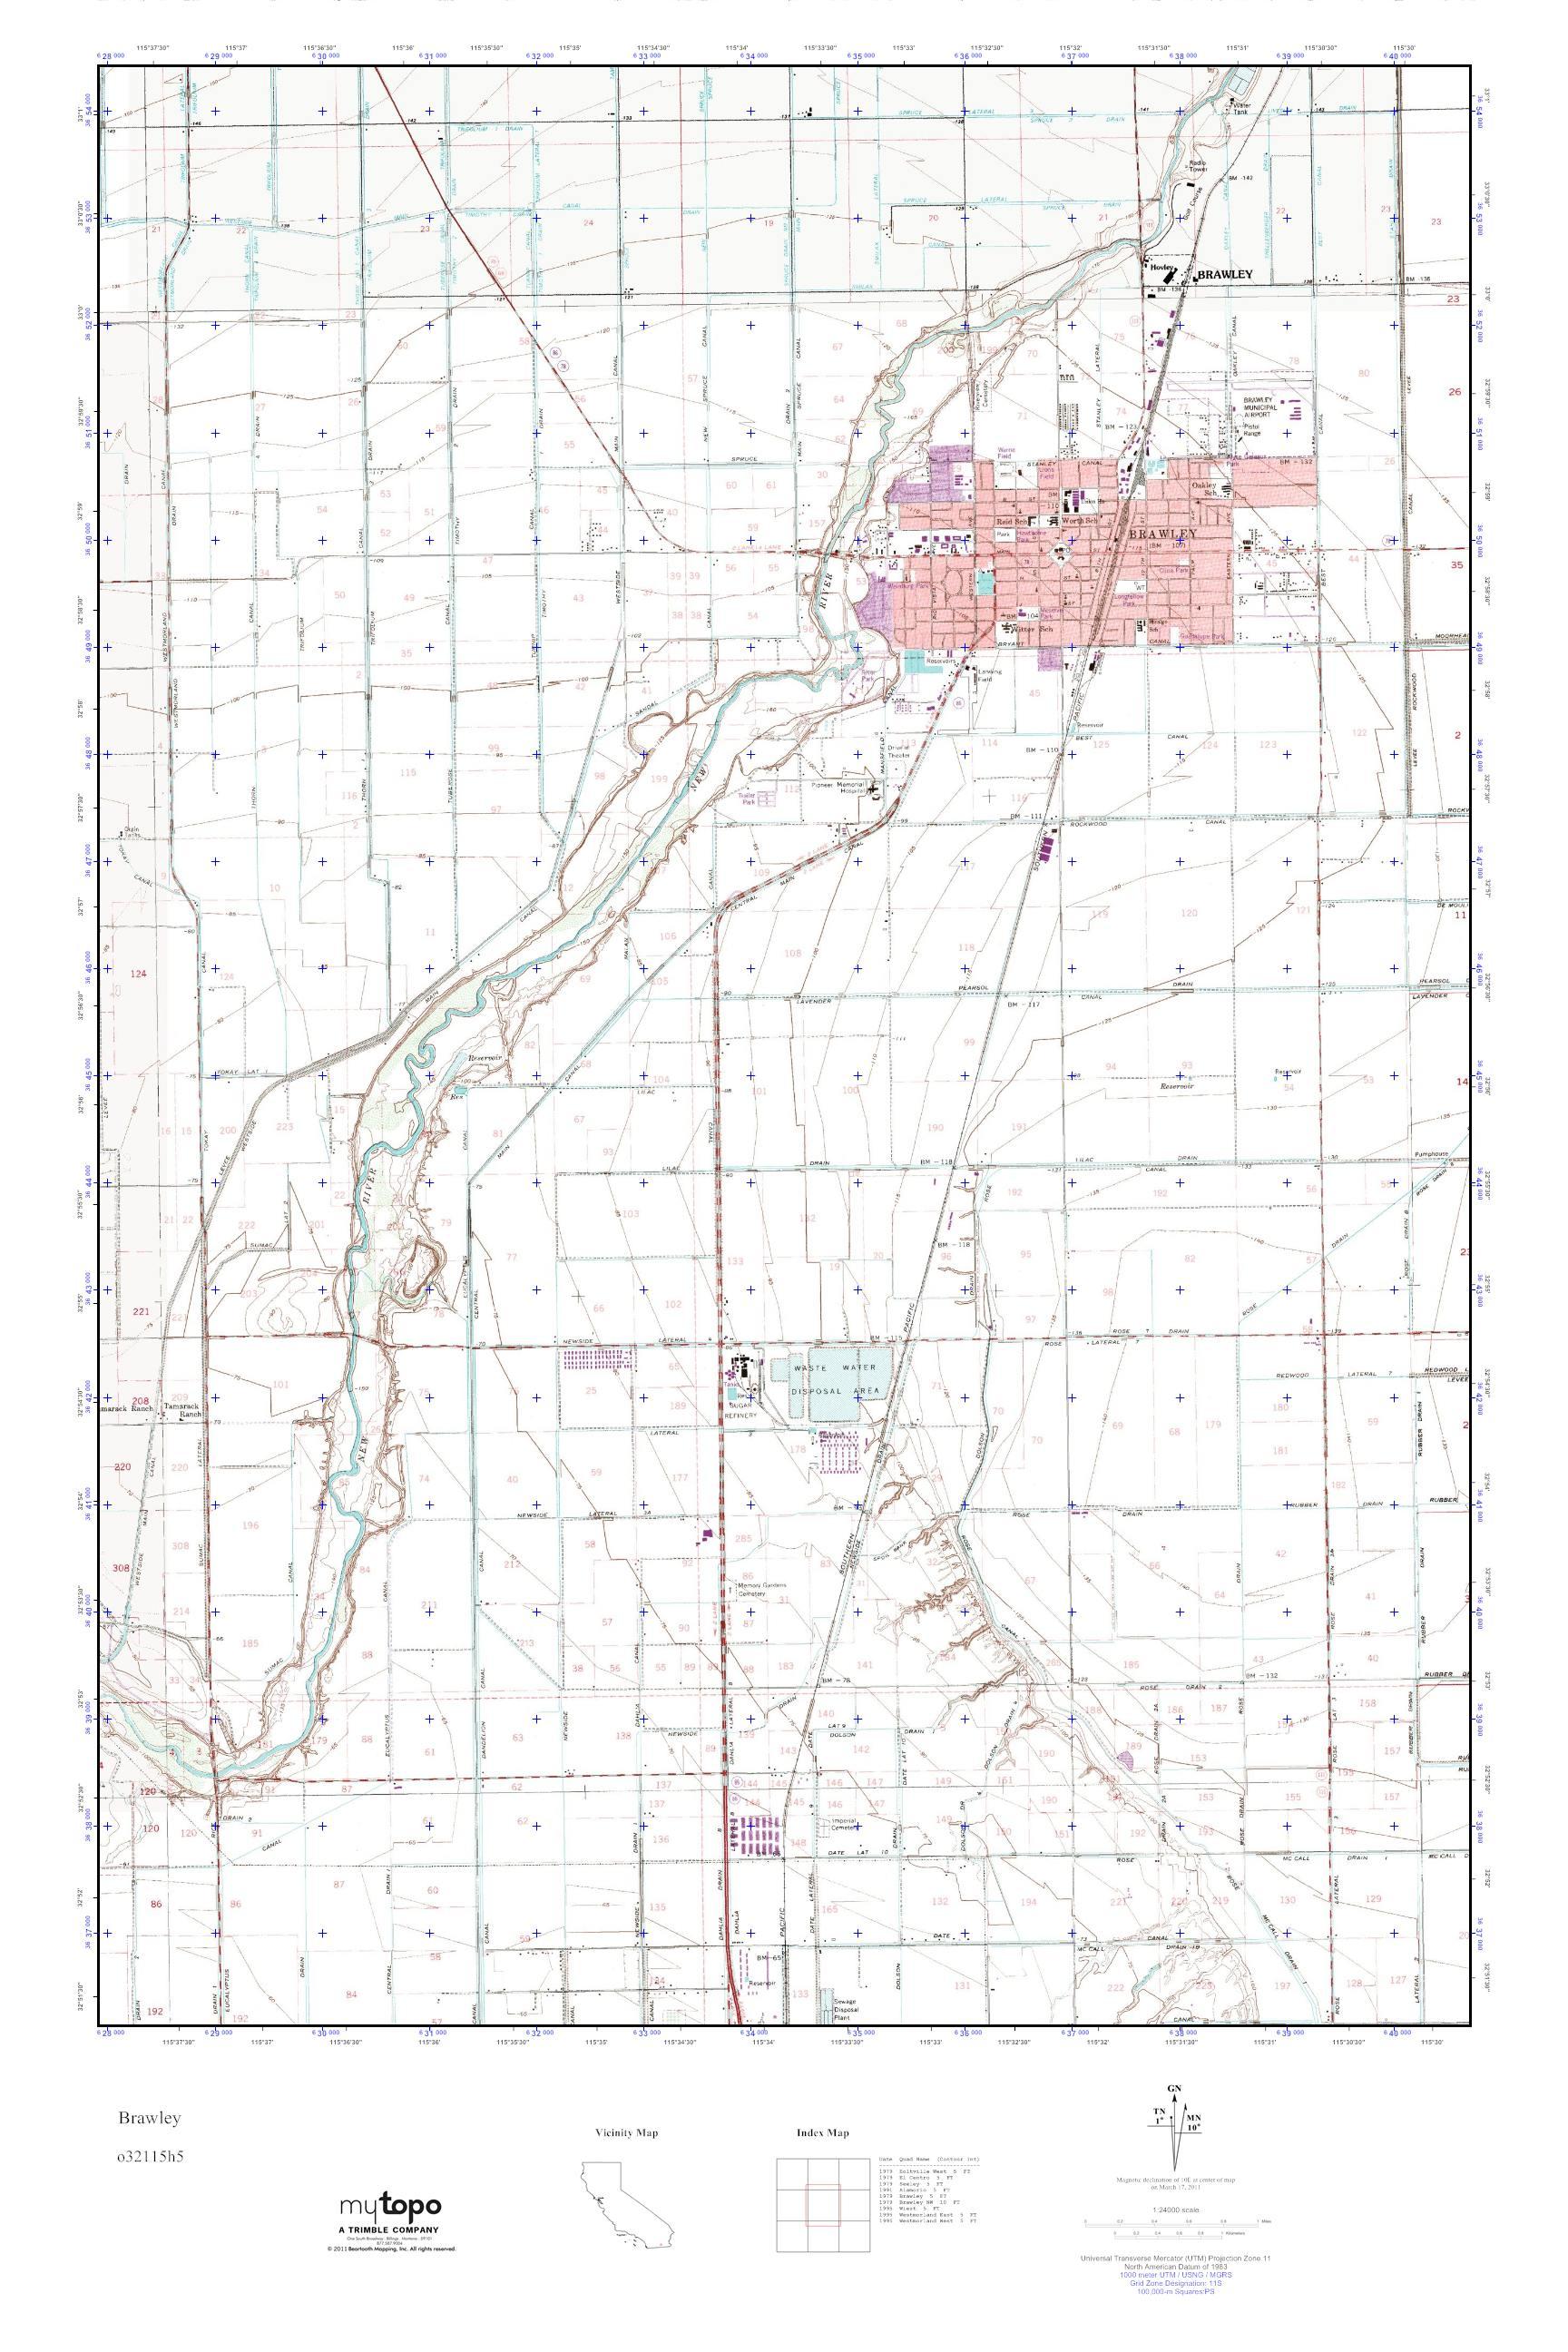 MyTopo Brawley, California USGS Quad Topo Map